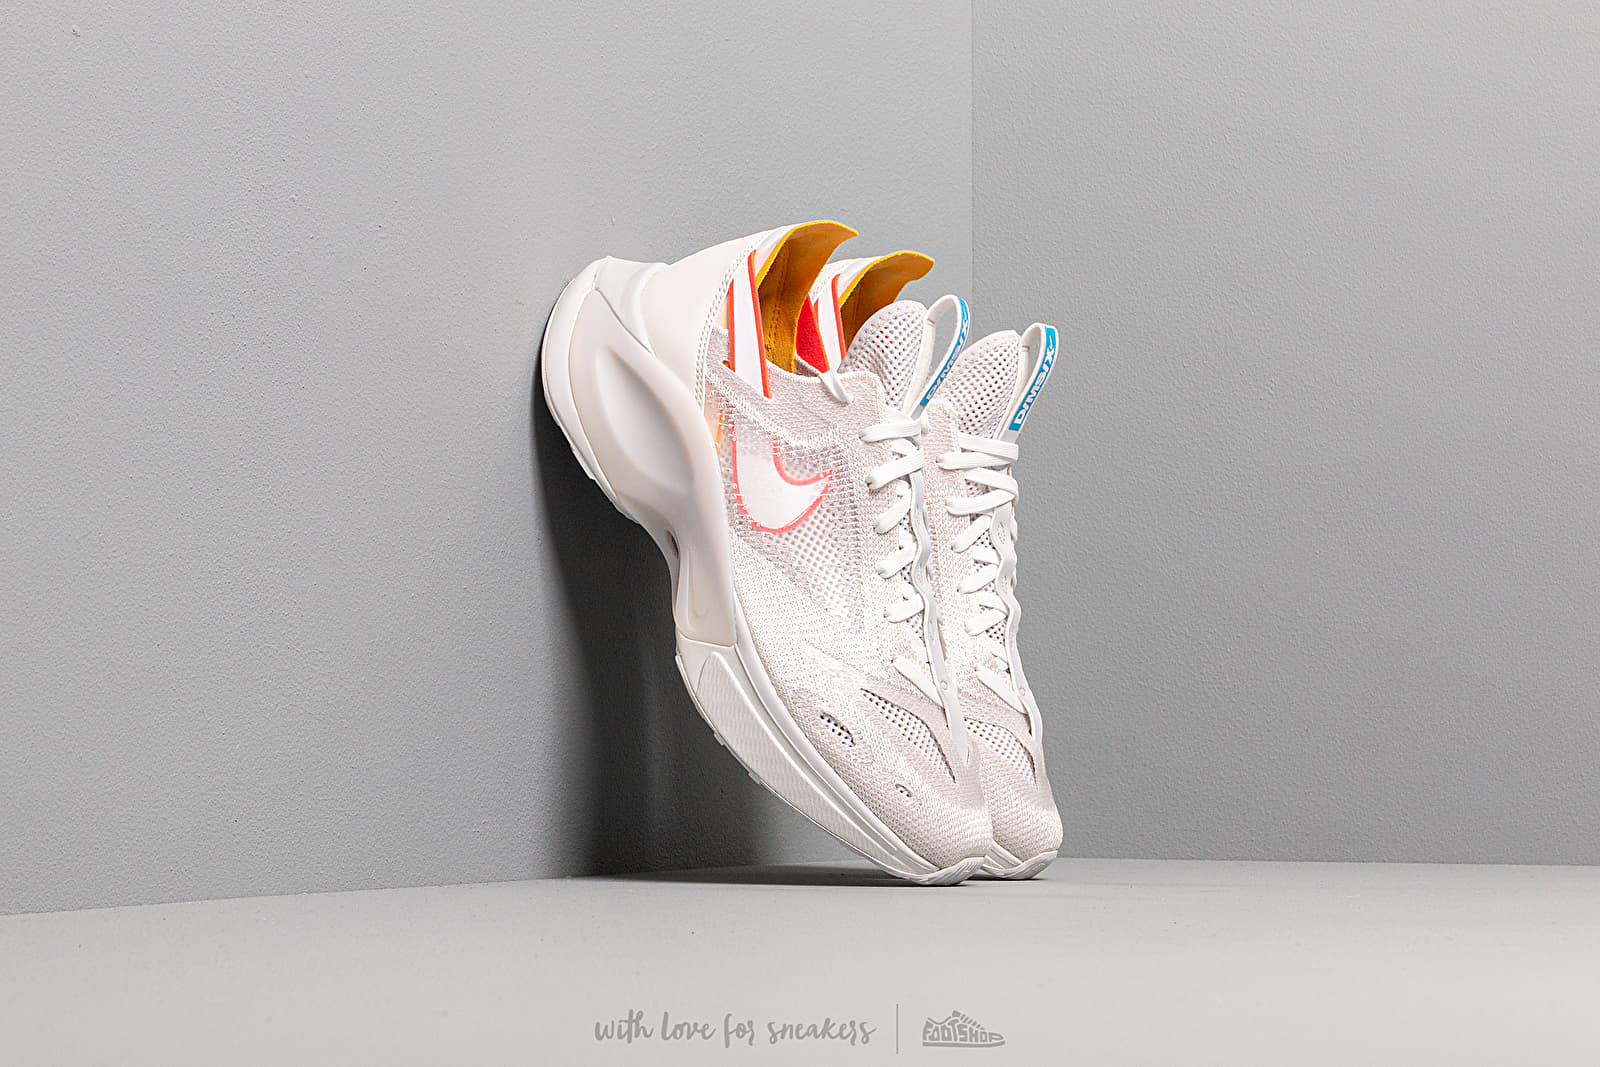 Pánské tenisky a boty Nike N110 D/MS/X Phantom/ White-Vast Grey-Blue Hero